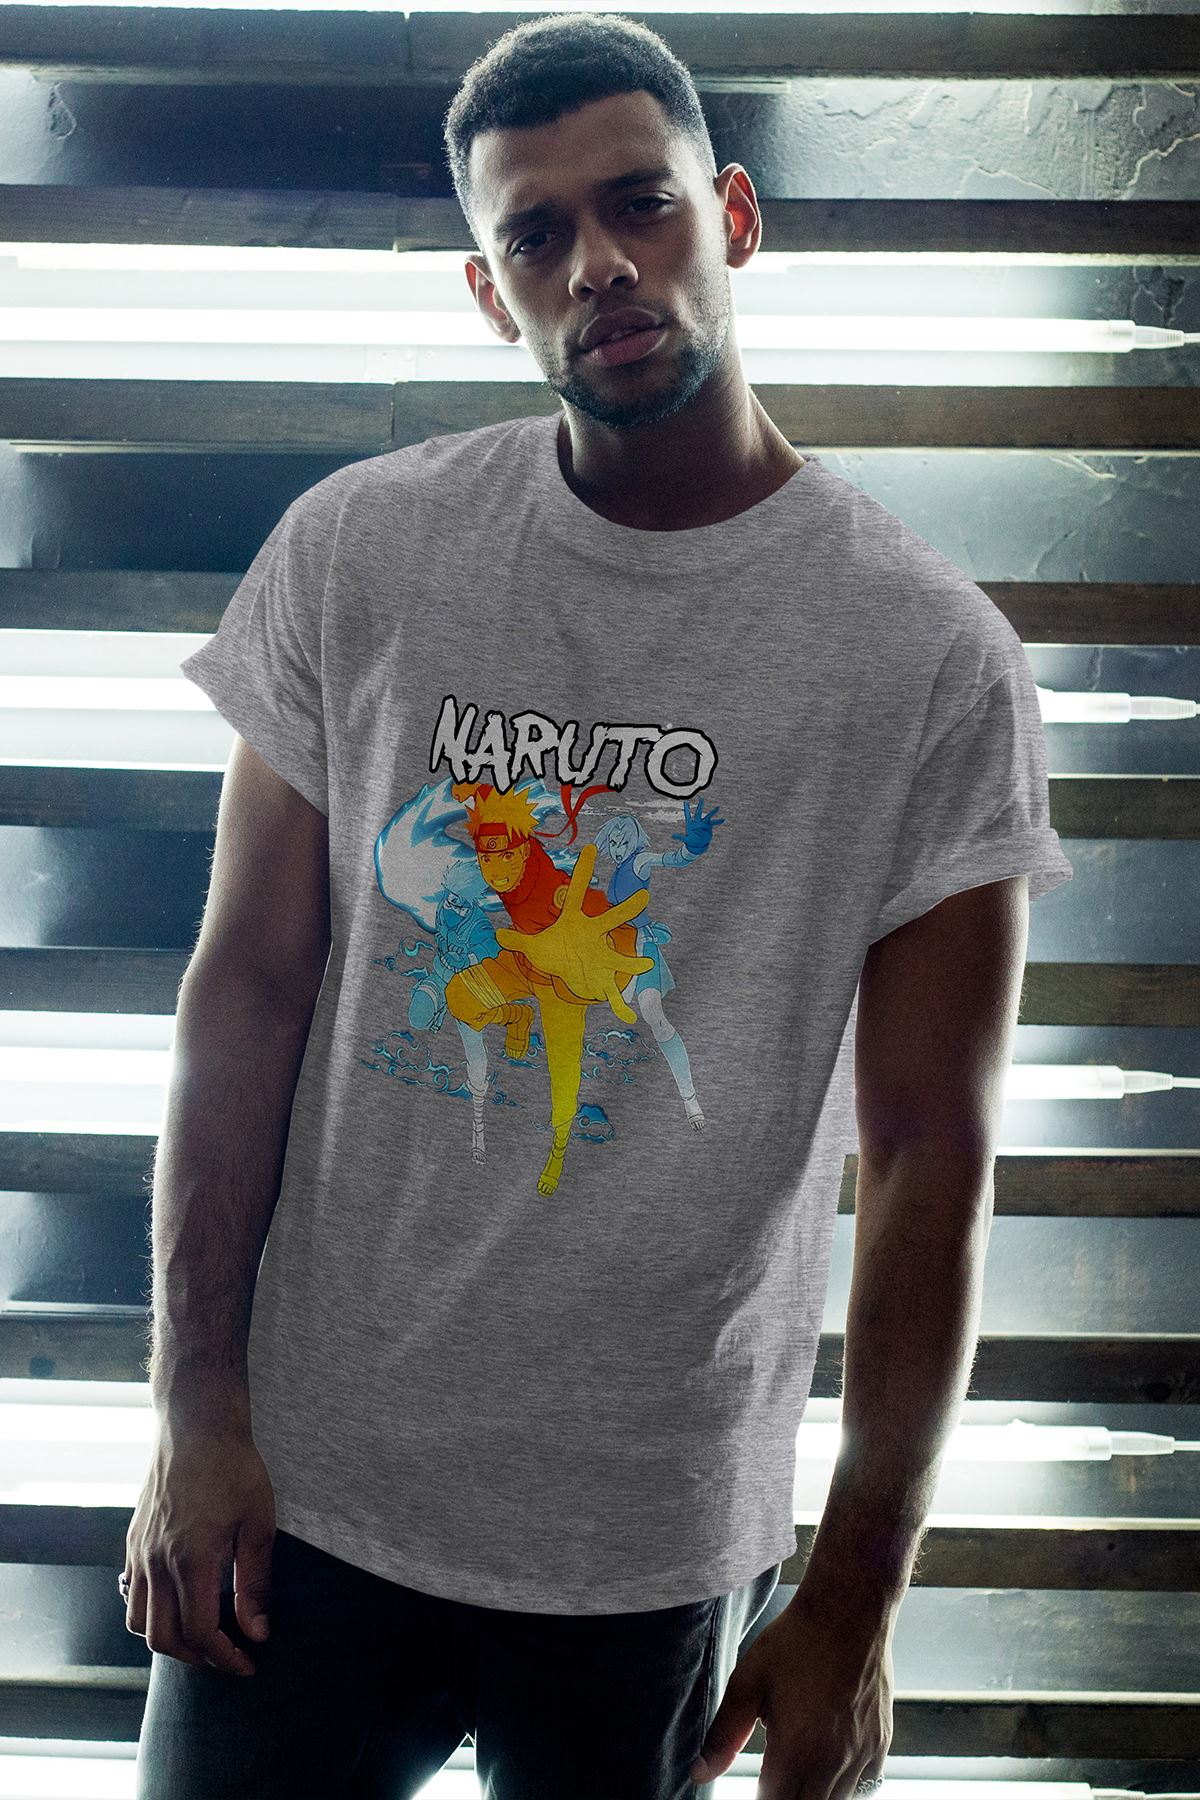 Naruto Anime 03 Gri Erkek Oversize Tshirt - Tişört